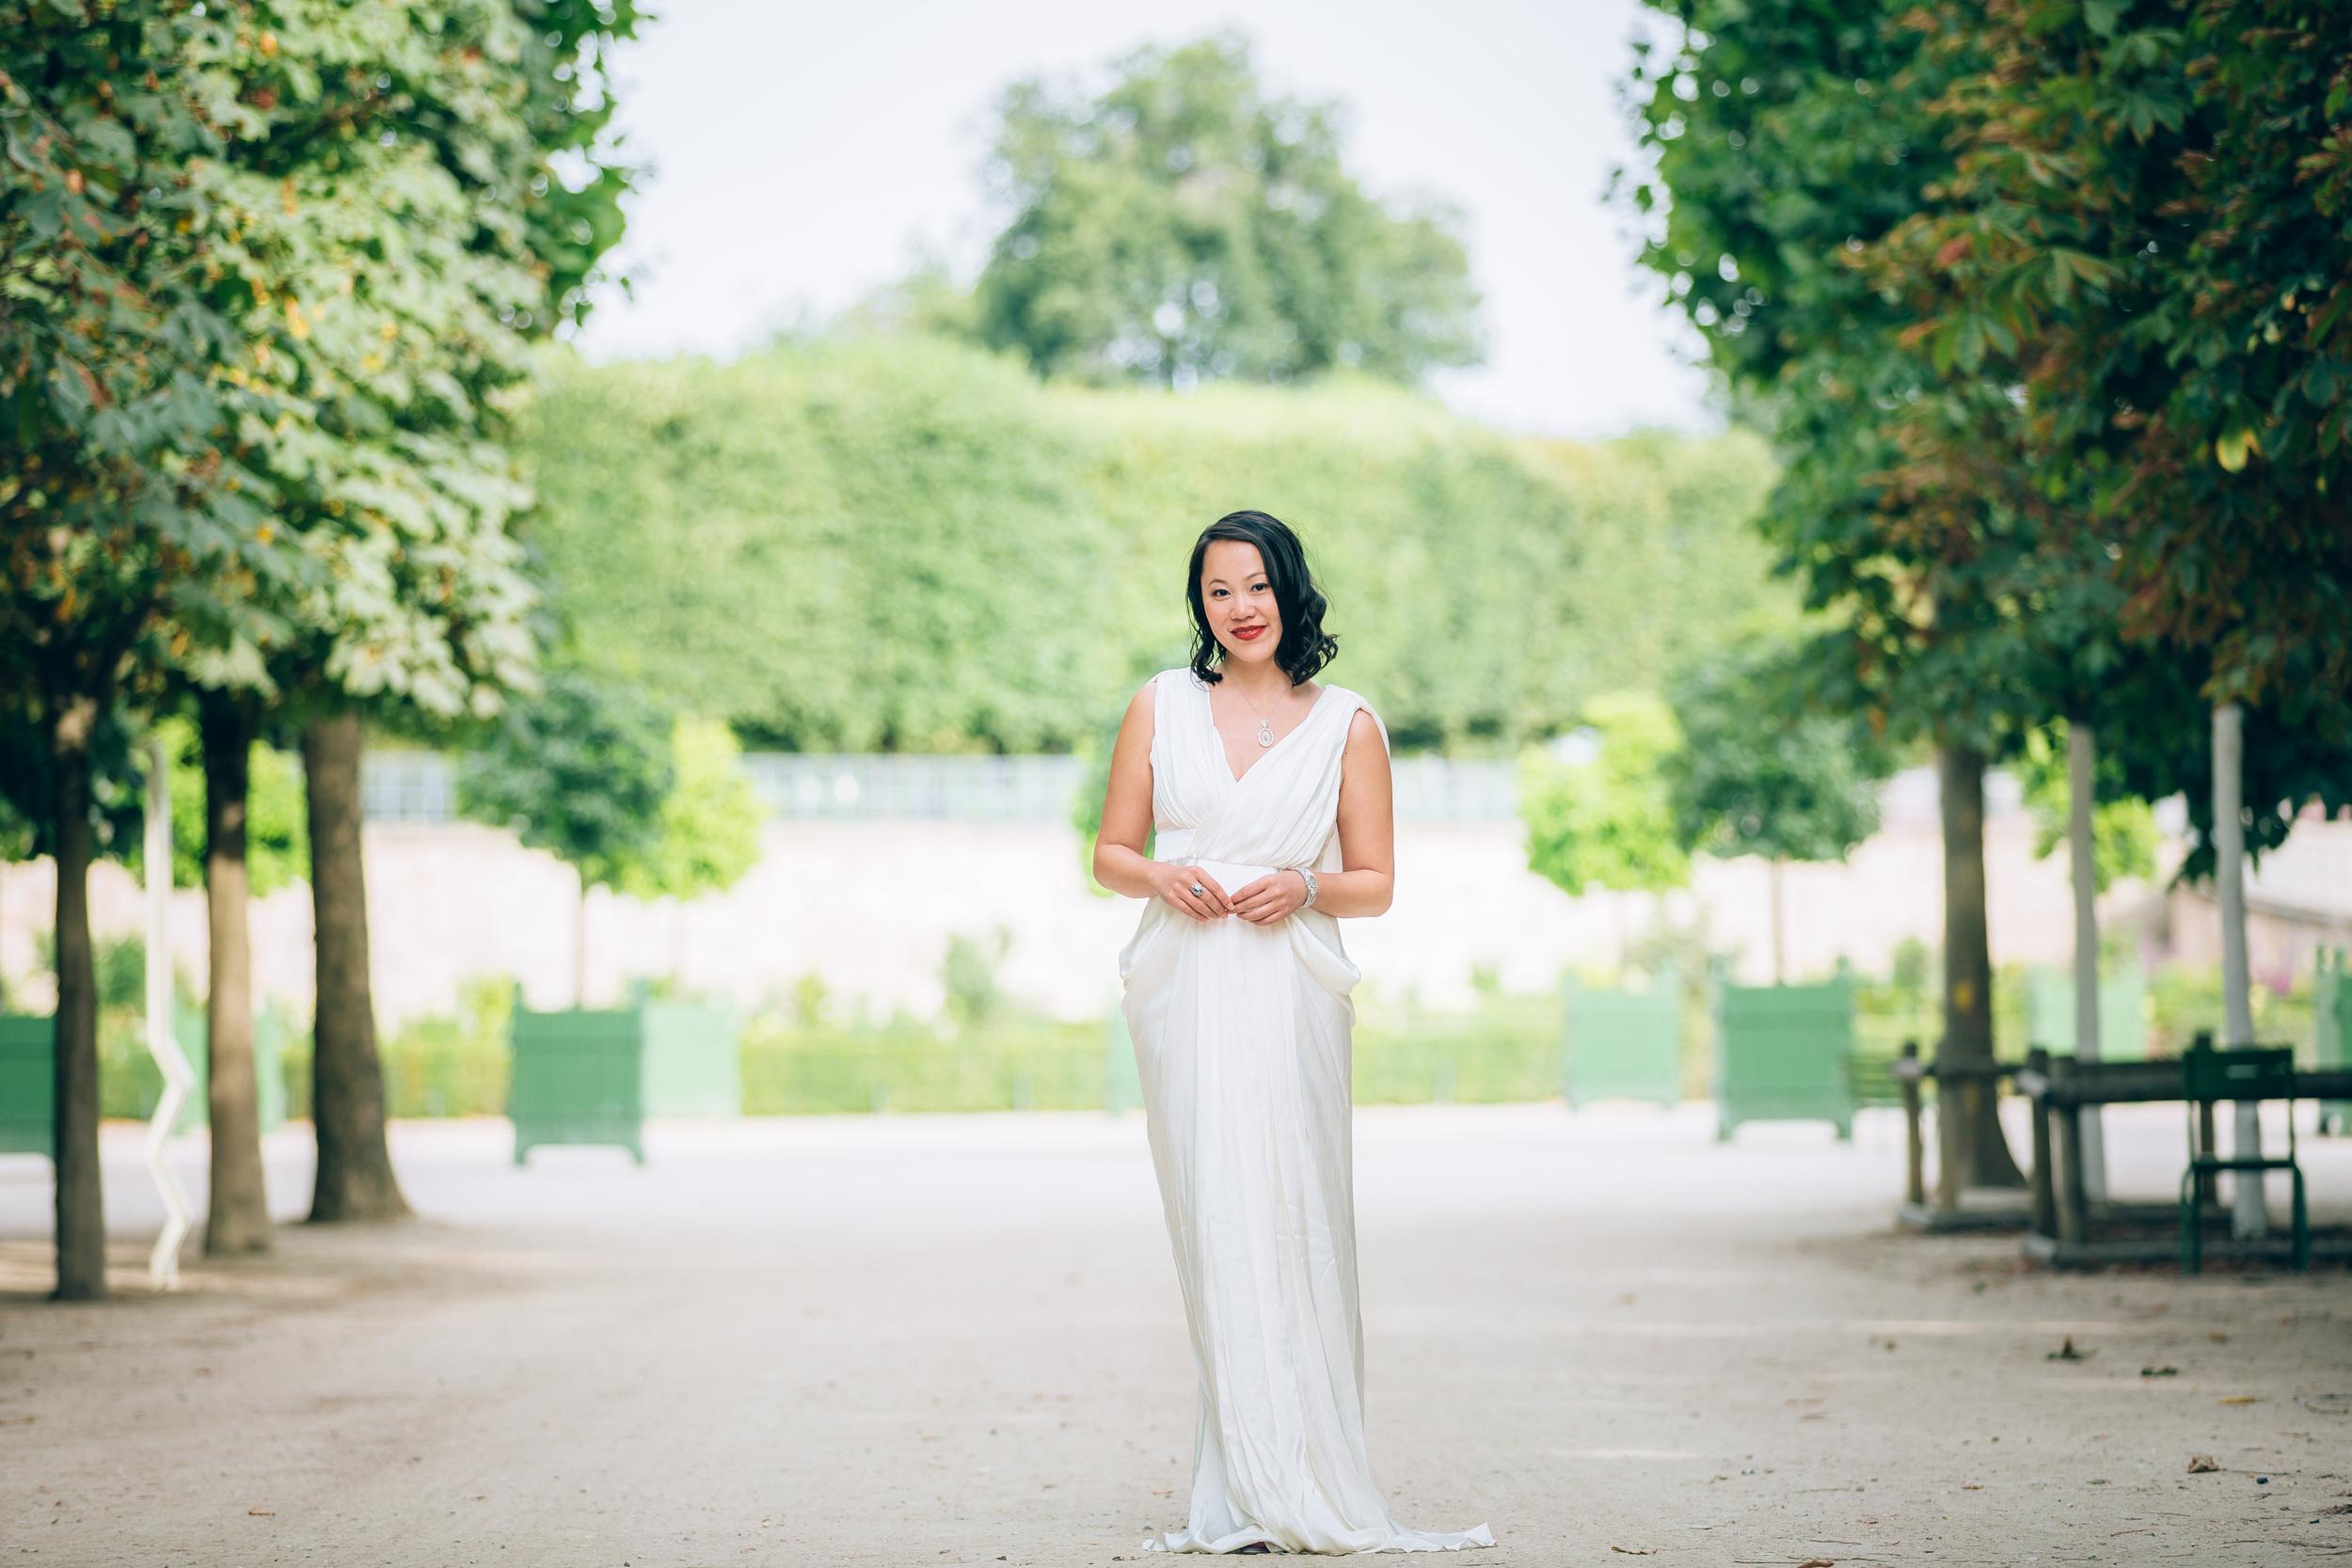 Photographer in Paris, Birthday, Tuileries garden, personal branding, IheartParisfr